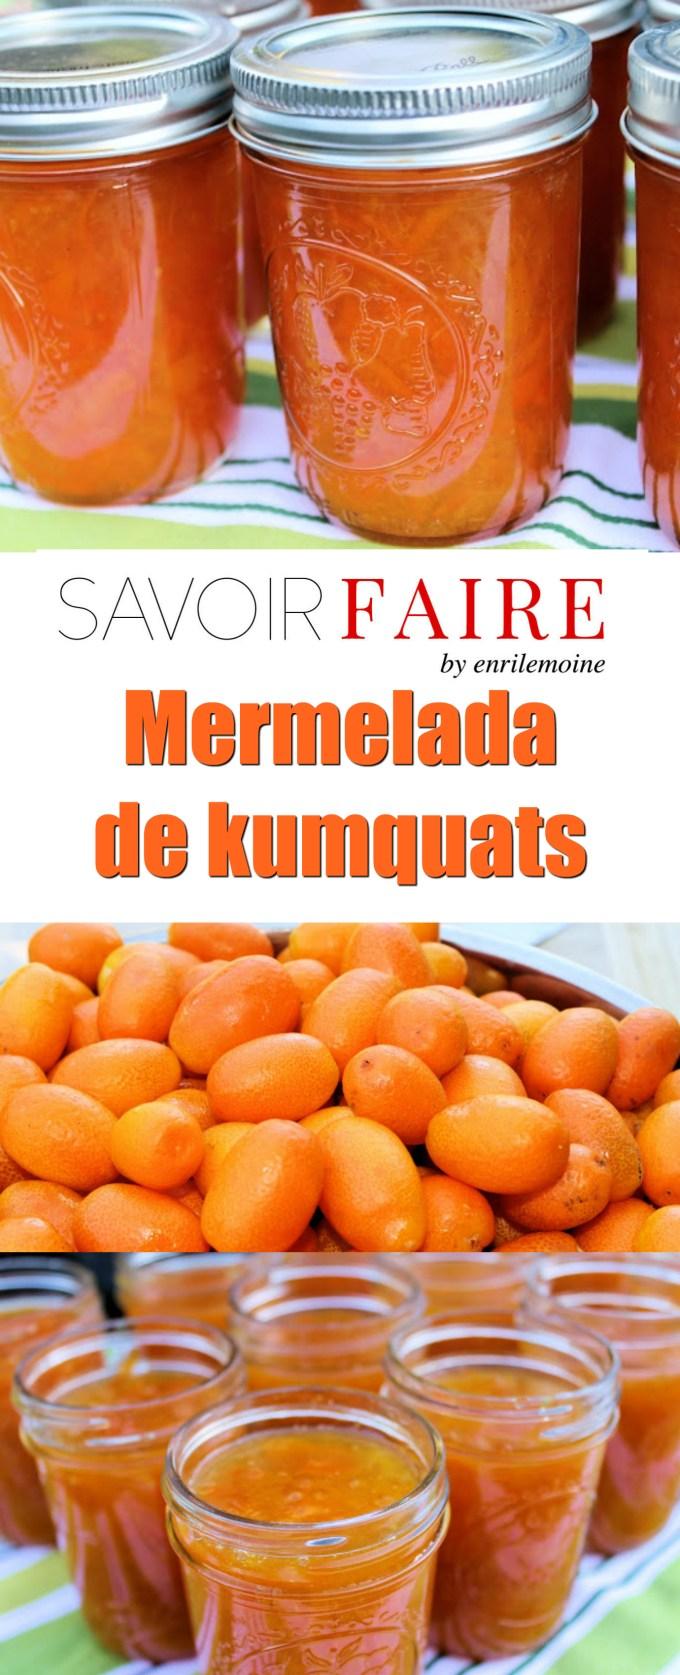 Mermelada de Kumquats SAVOIR FAIRE by enrilemoine